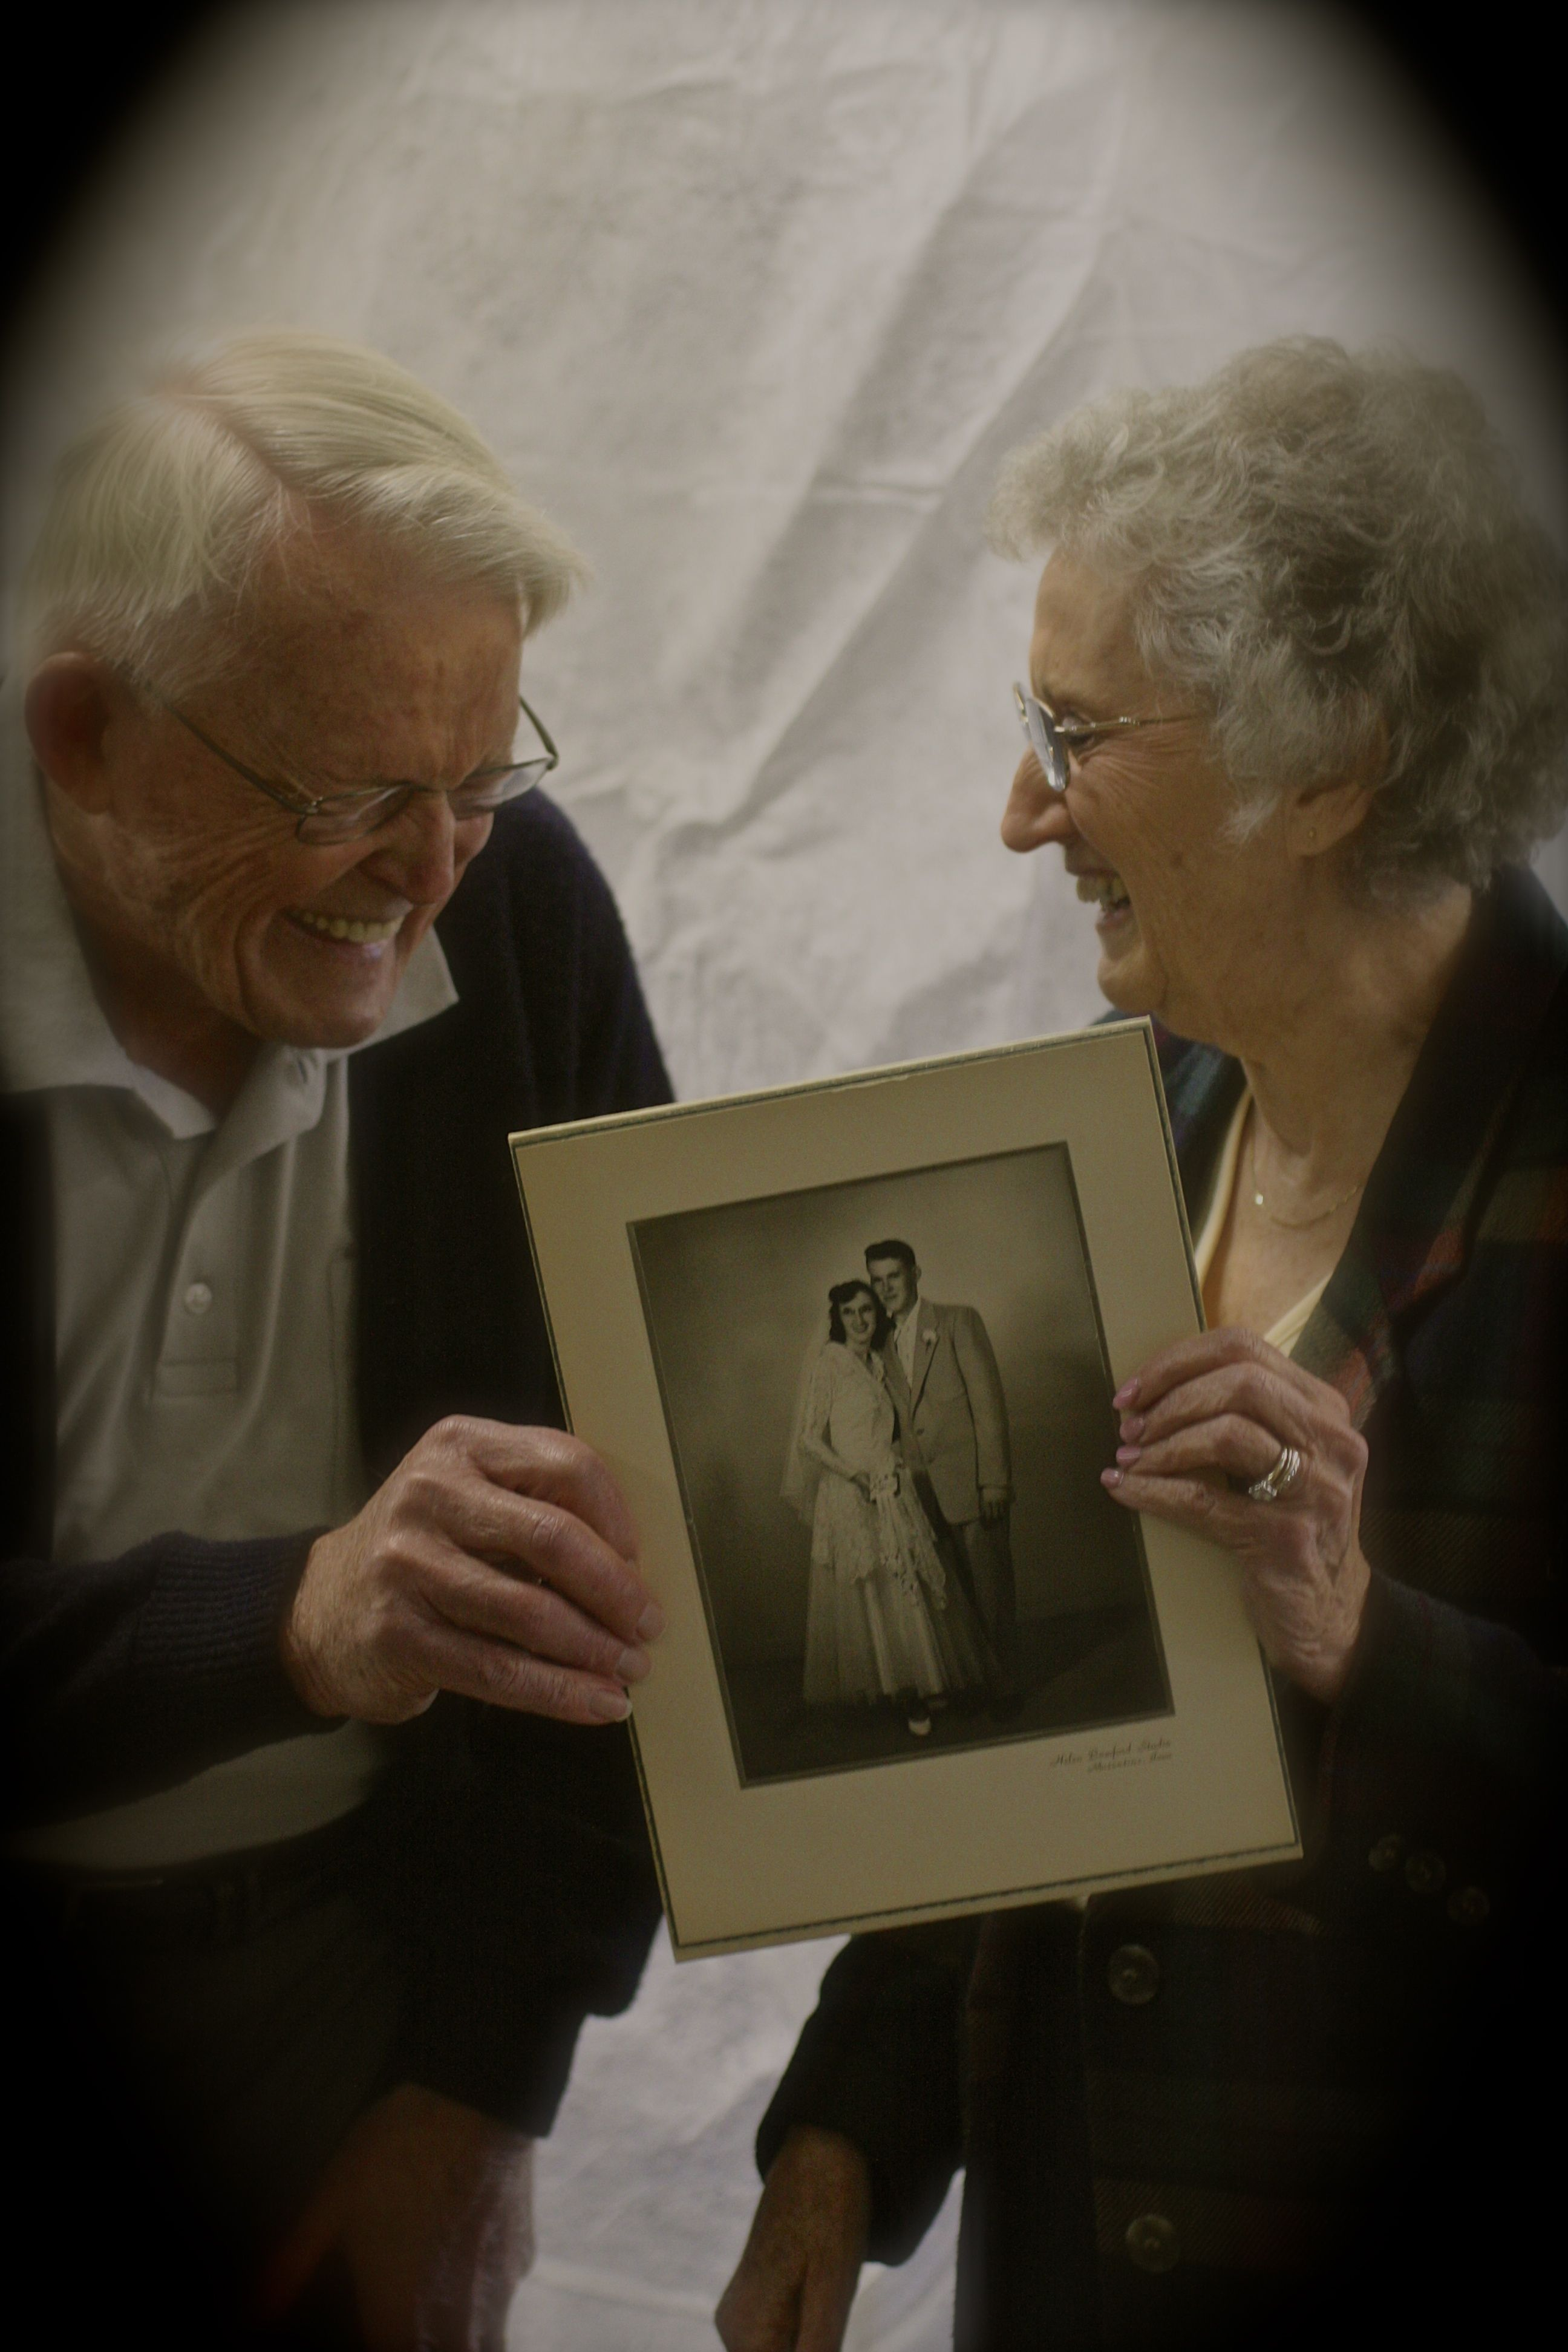 60th wedding anniversary photo photo ideas pinterest 60